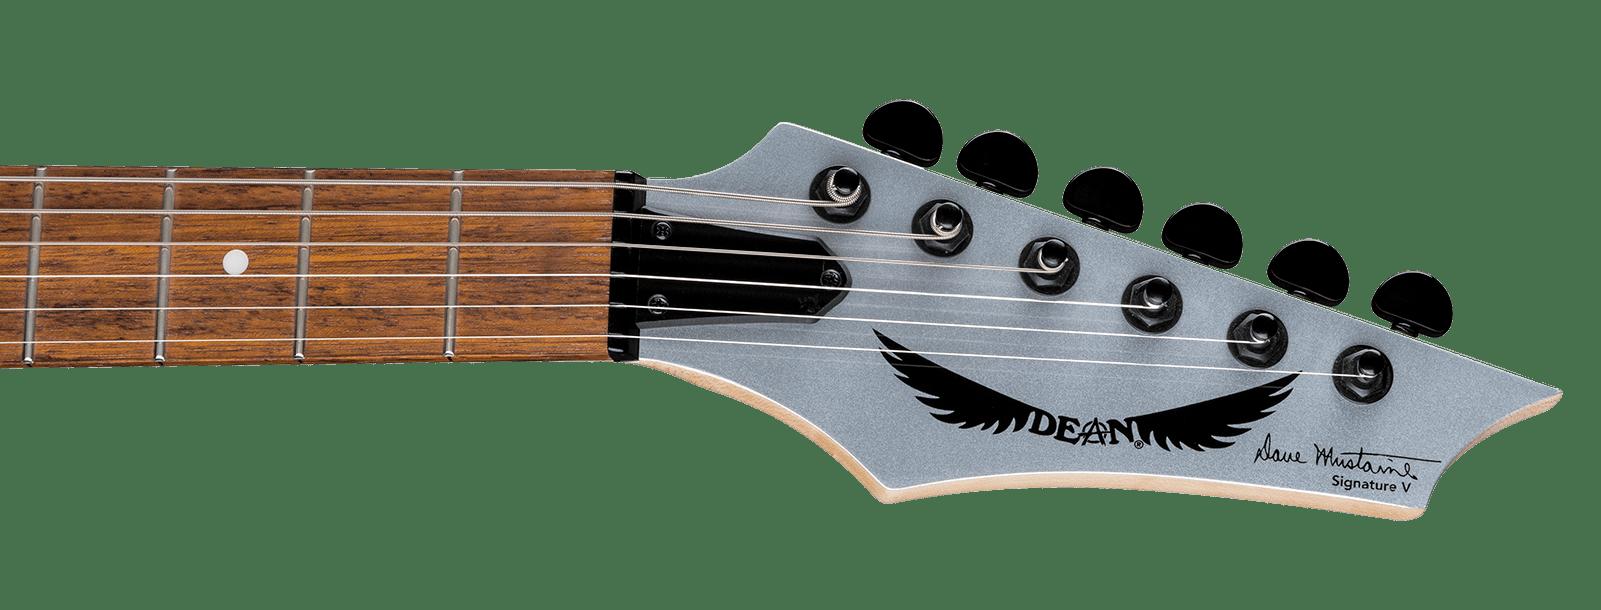 Dean Cadillac Wiring Diagram Books Of Guitar Gallery Sample